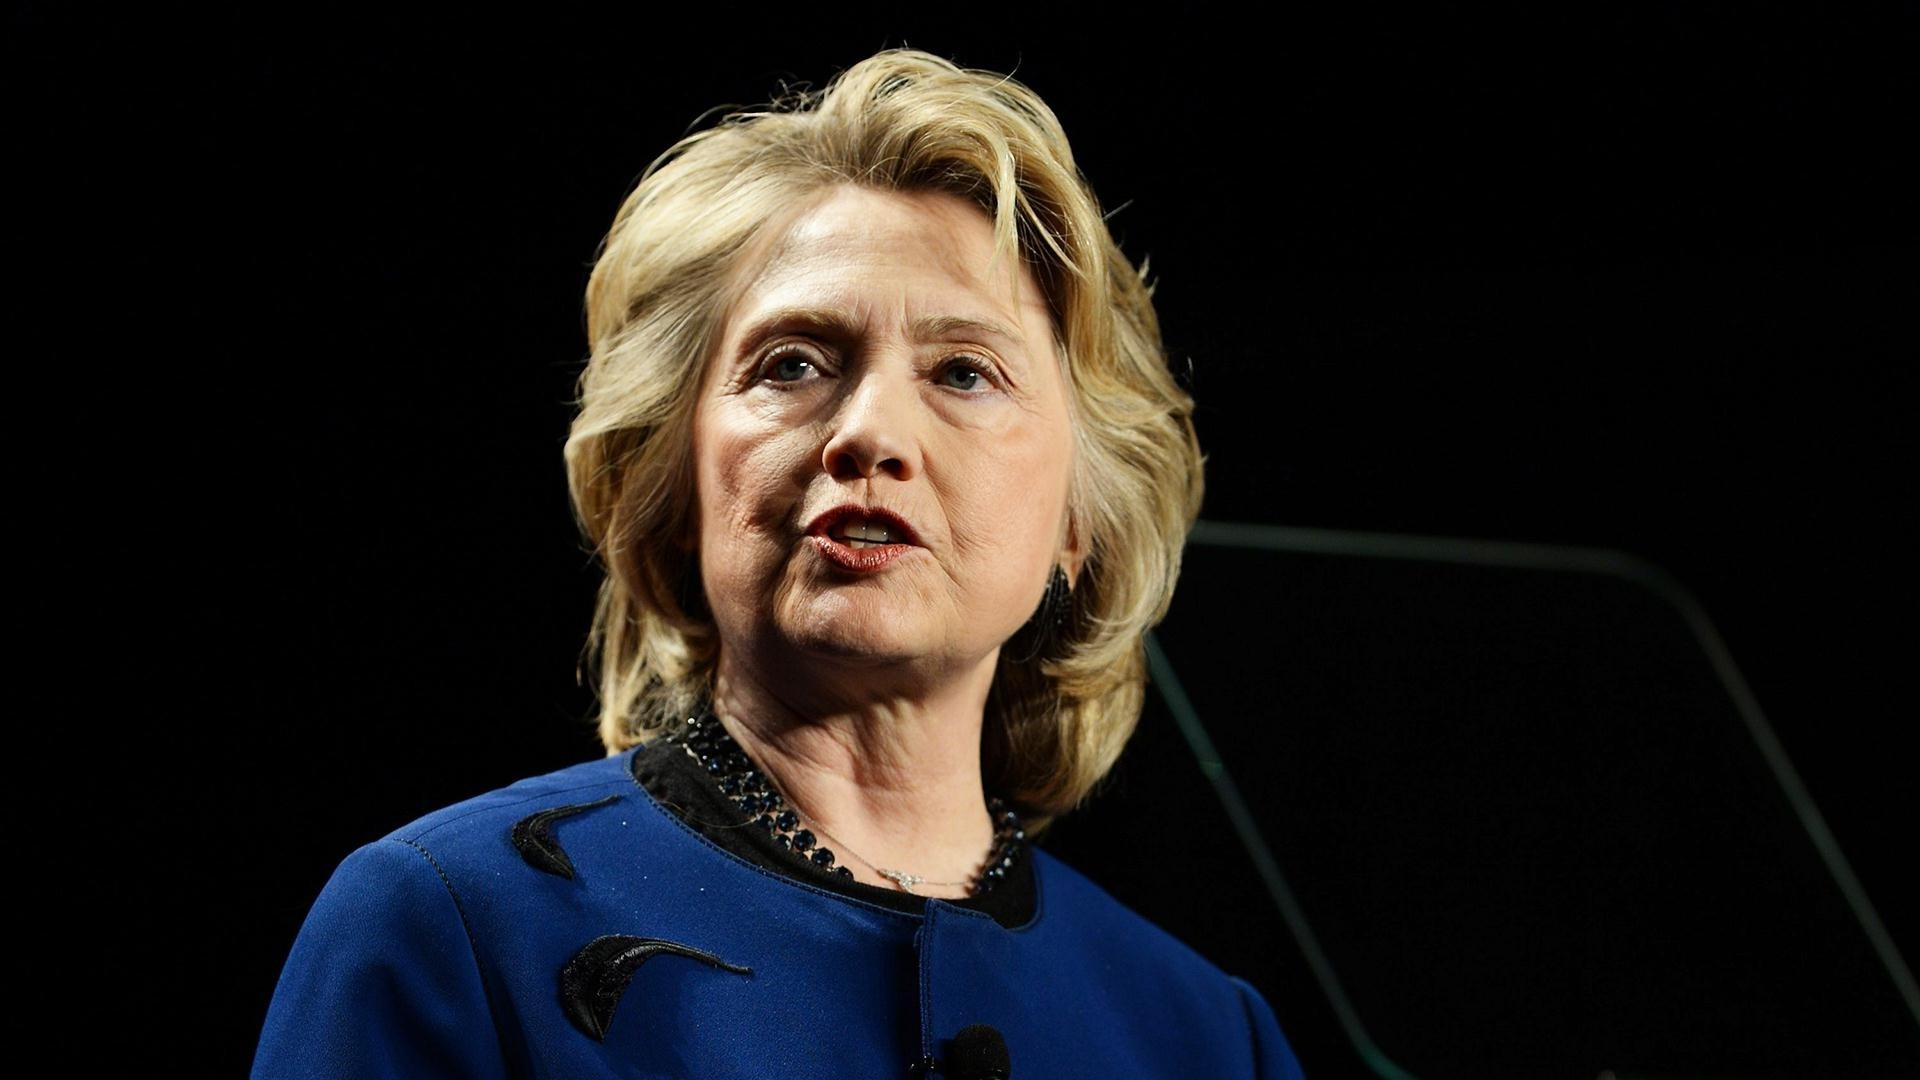 Hillary Clinton Wallpaper.